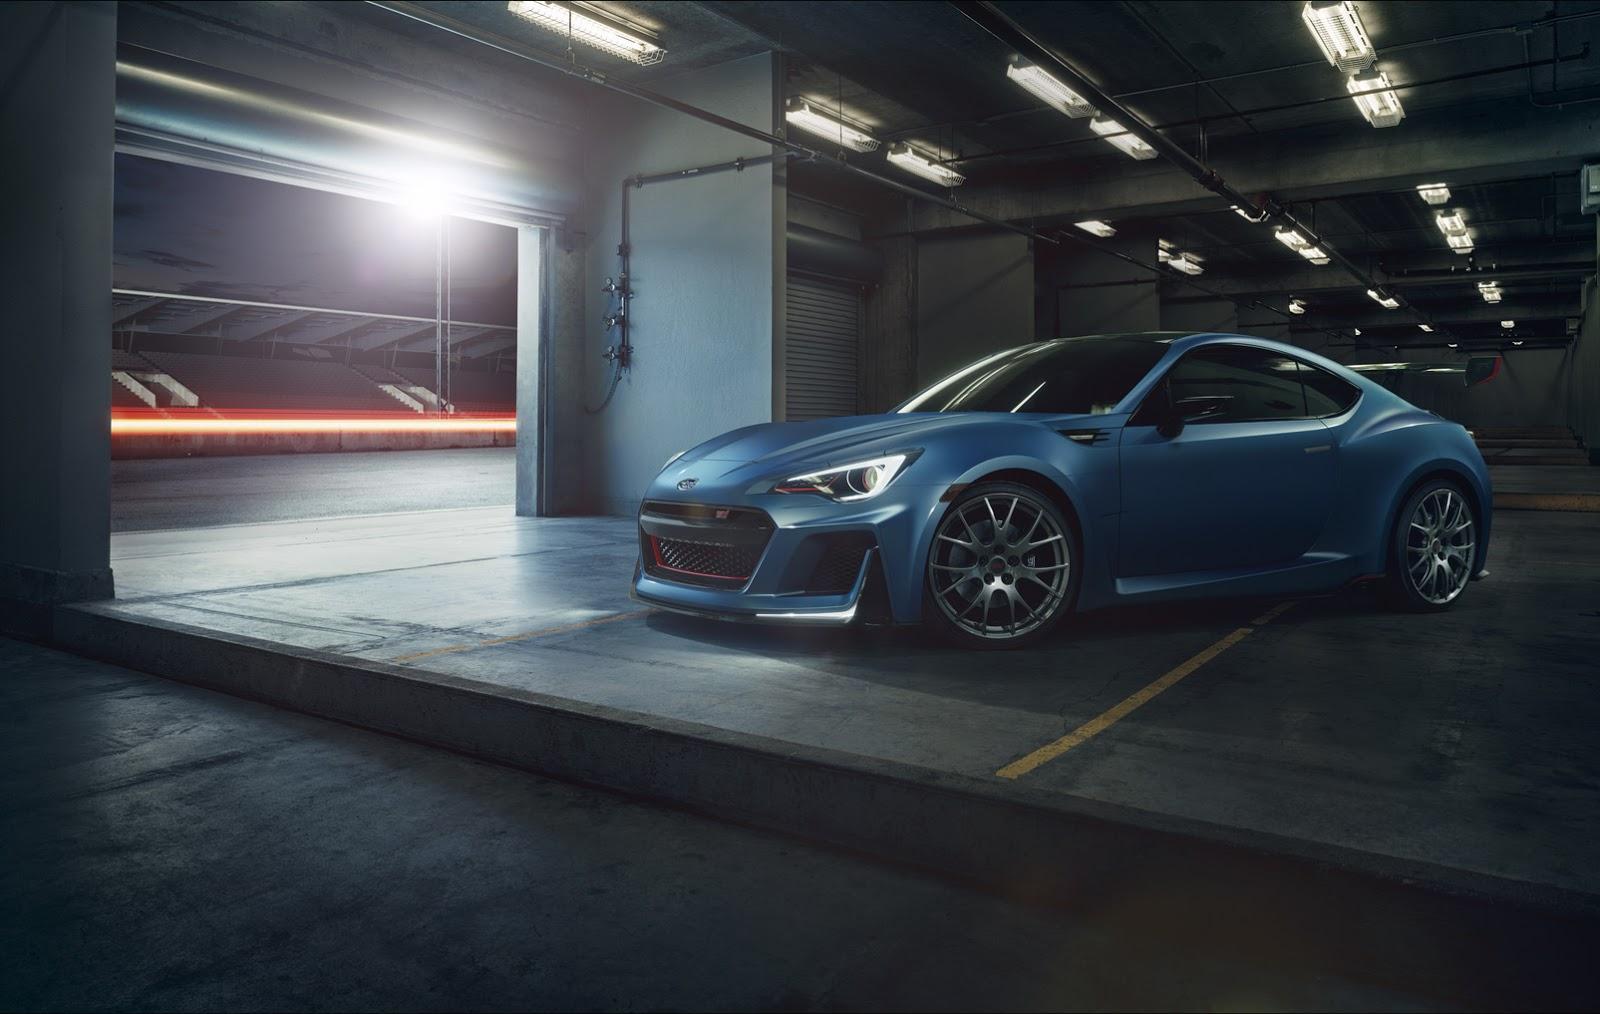 Subaru Makes Their BRZ STI Performance Concept Official